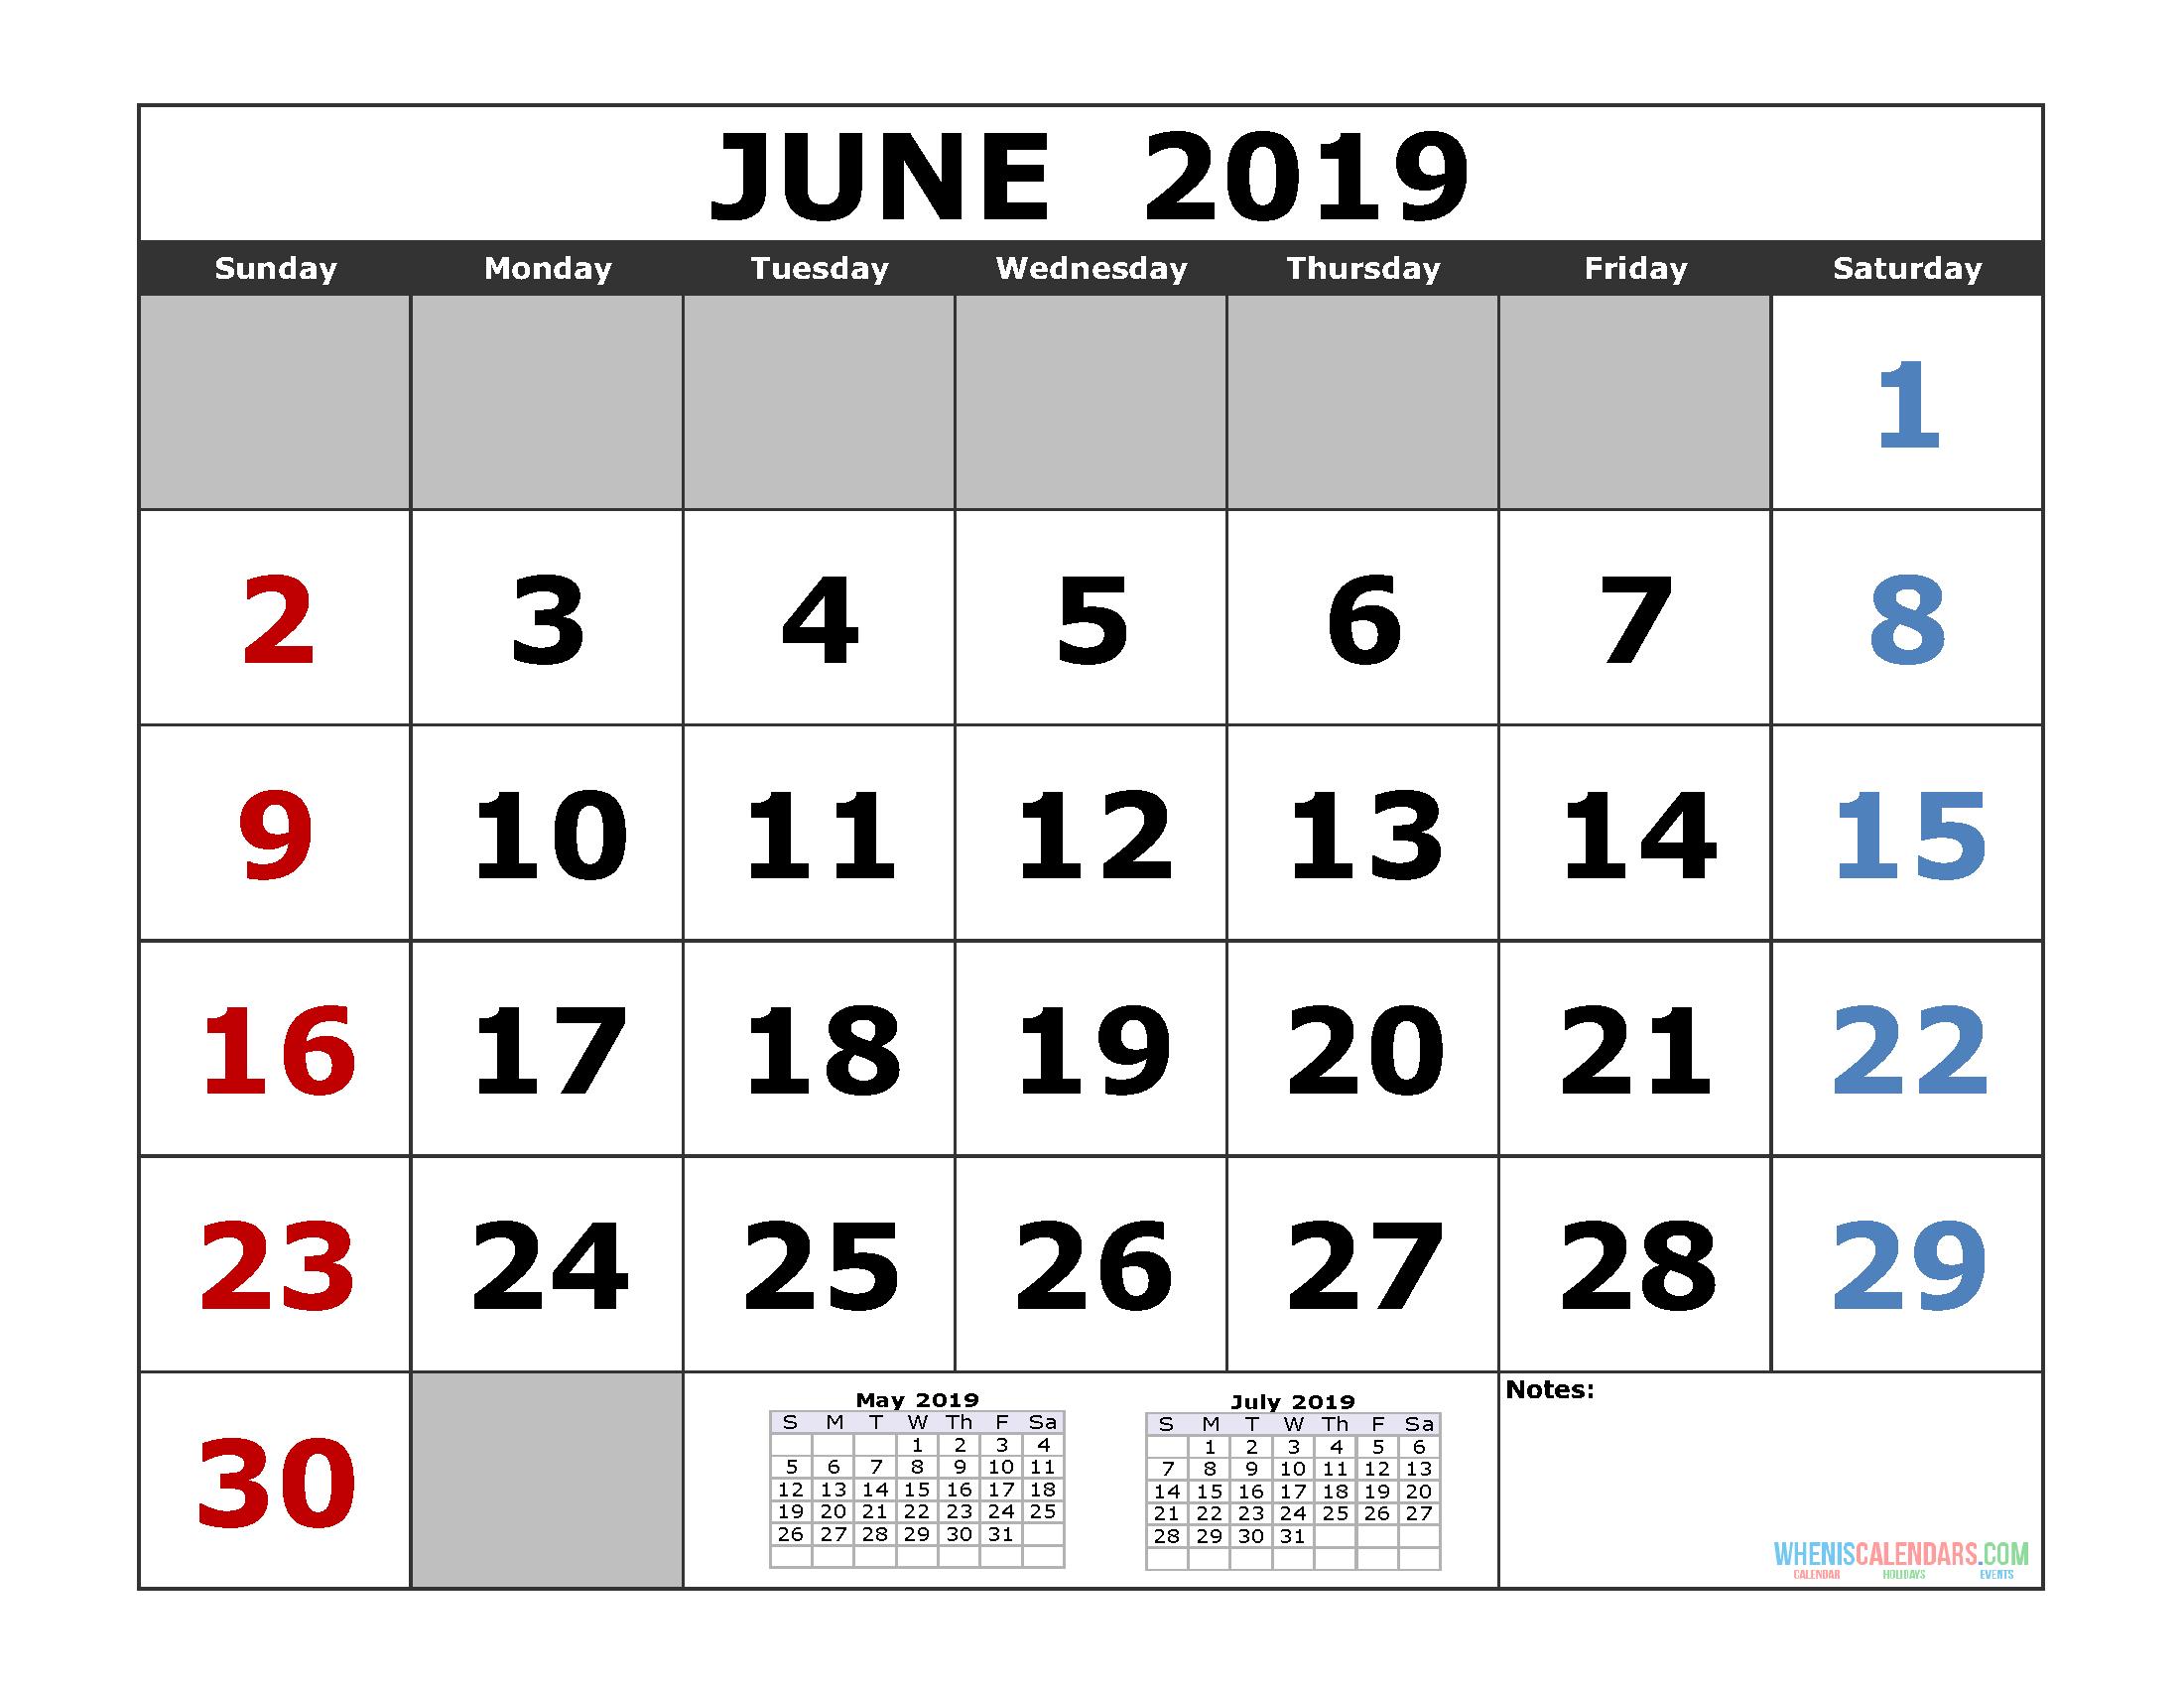 Free June 2019 Printable Calendar Templates [Us. Edition] | Free July 3 2019 Calendar